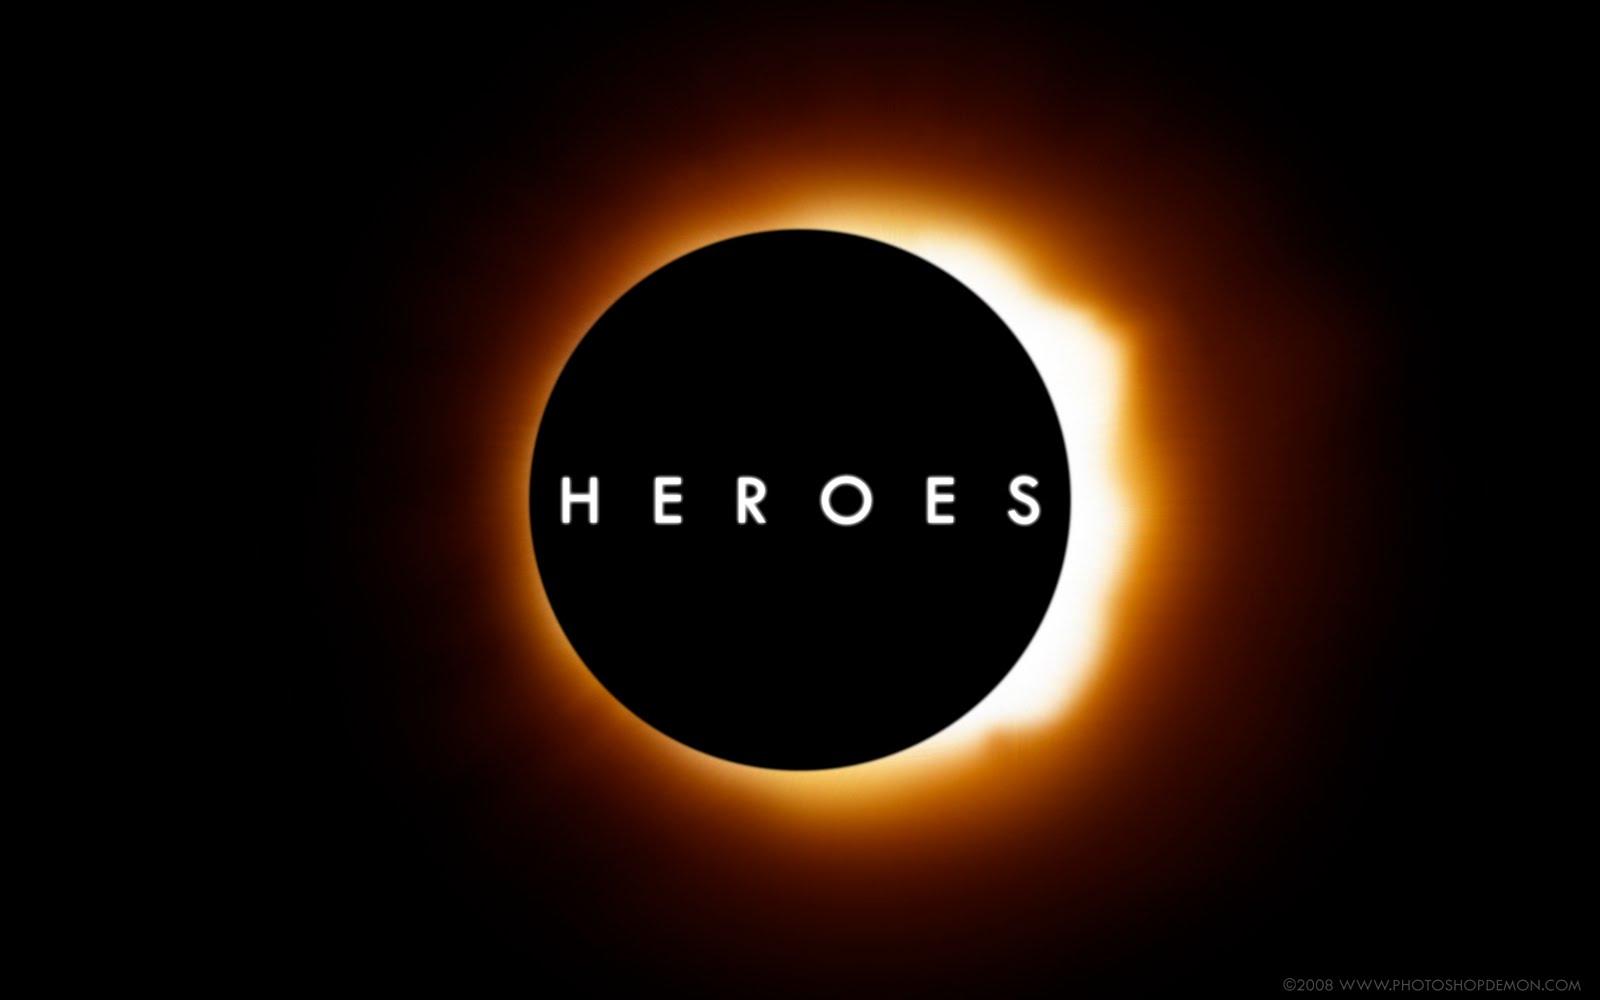 http://2.bp.blogspot.com/-oYdSdjTtwBA/TscT1a1rlQI/AAAAAAAAAZE/jah17FSyHFo/s1600/hero-wallpaper-hd-7-789314.jpg